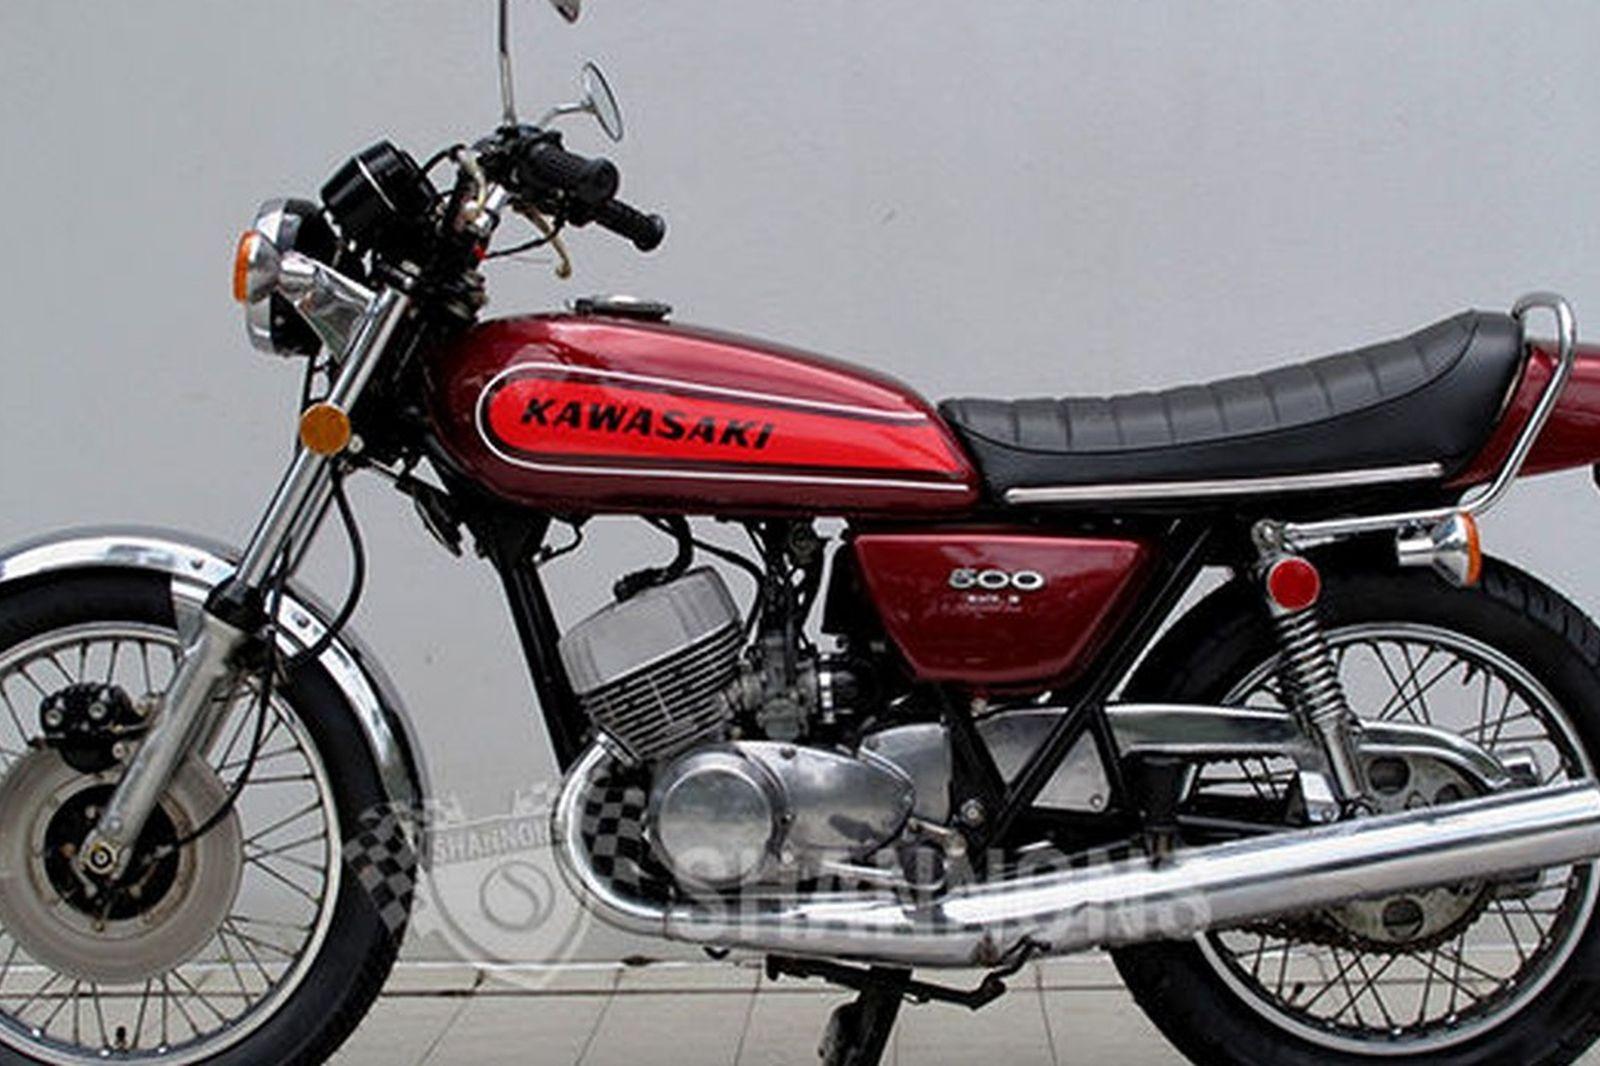 Kawasaki H1e 500 Motorcycle Auctions Lot Ae Shannons